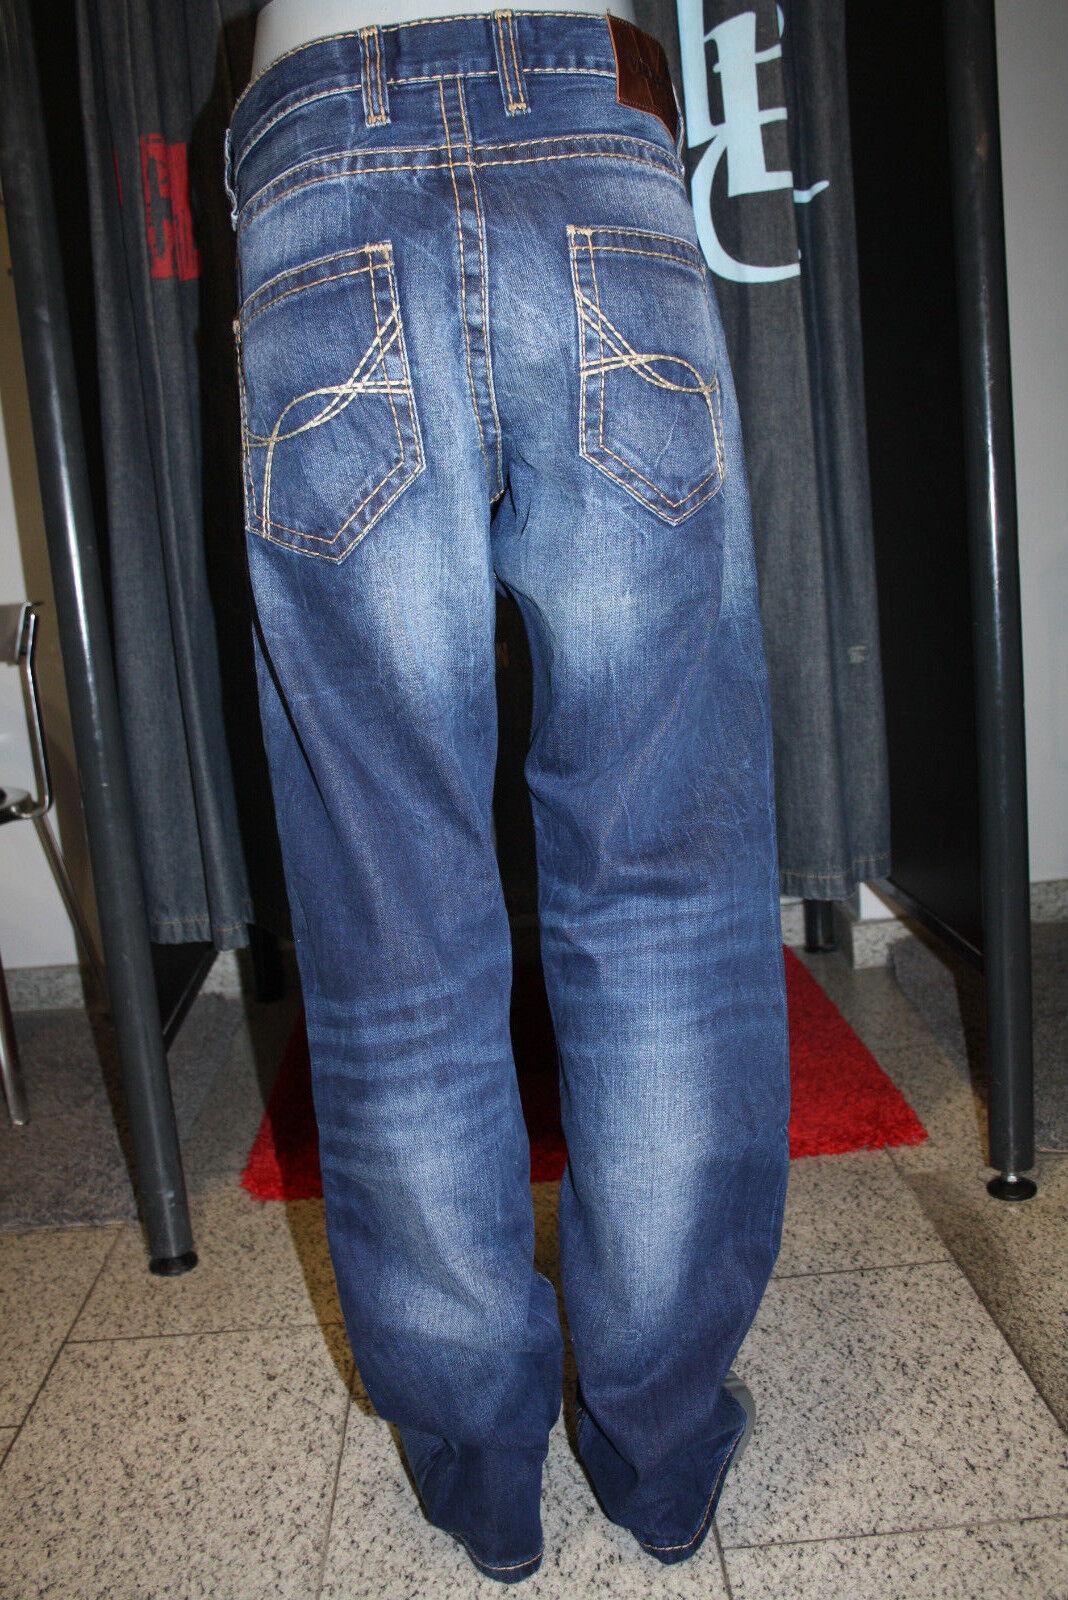 Viazoni Viazoni Viazoni Jeans Hugo blu NEW MODELLO 2018 straight-Fit Jeans Spessore Cuciture Best ebfc42